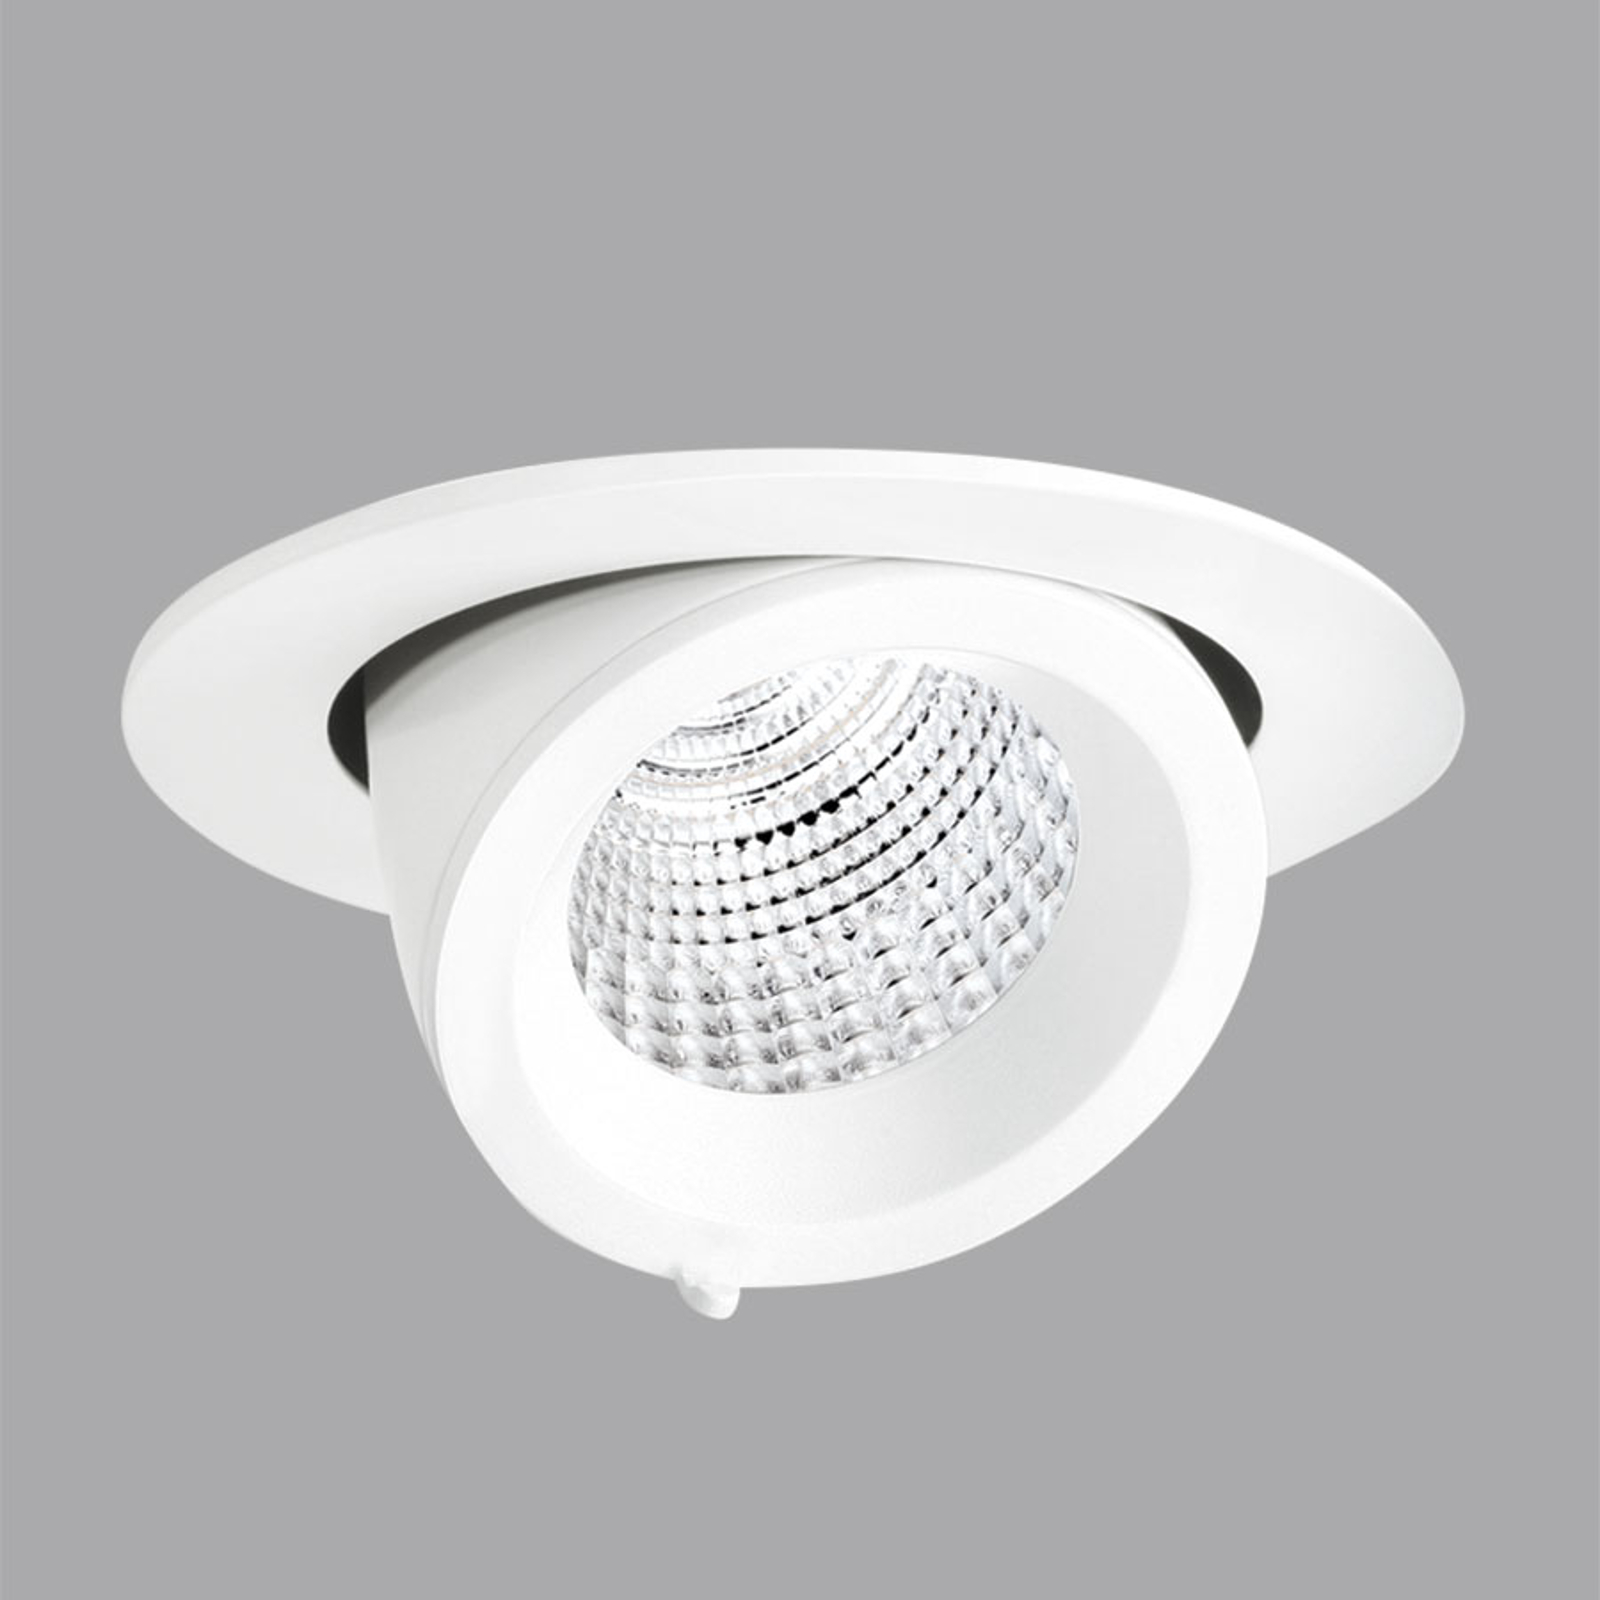 Inbouwlamp EB431 LED spot reflectorlamp wit 4.000K